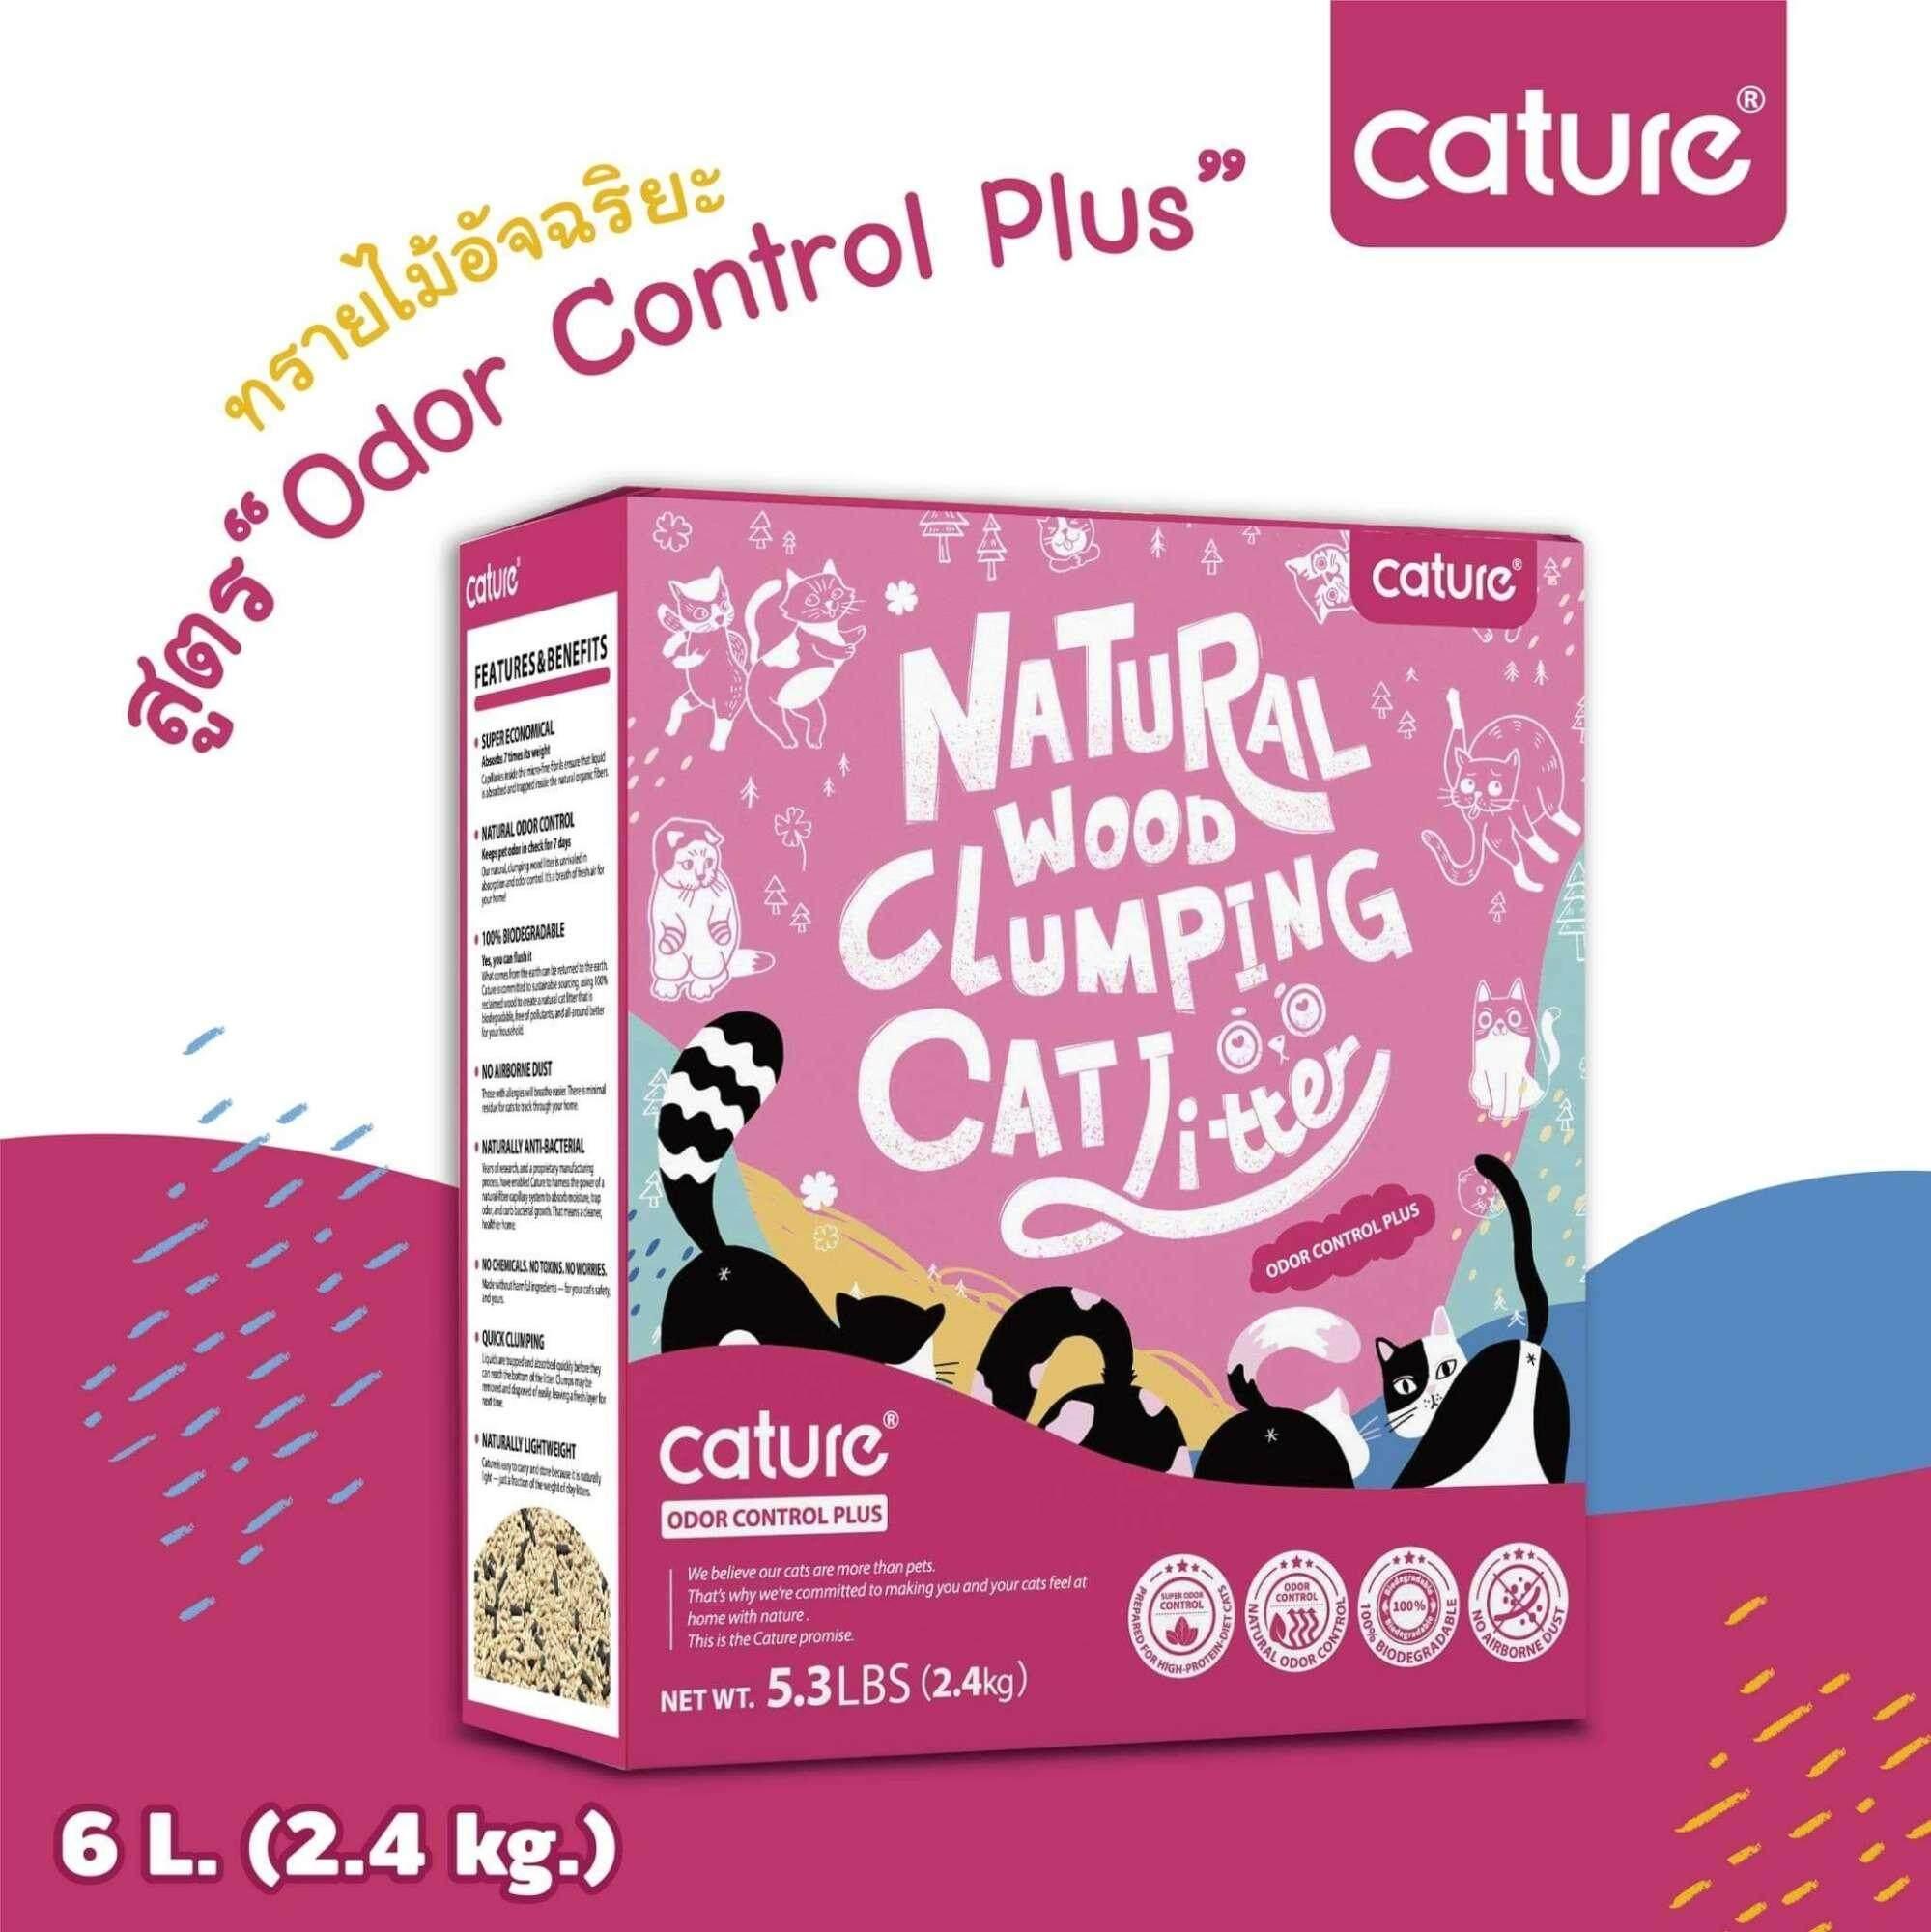 Cature ทรายแมวไม้สนอัจฉริยะ สูตร Odorcontrolplus (6l) By Fairycoonz Petshop.